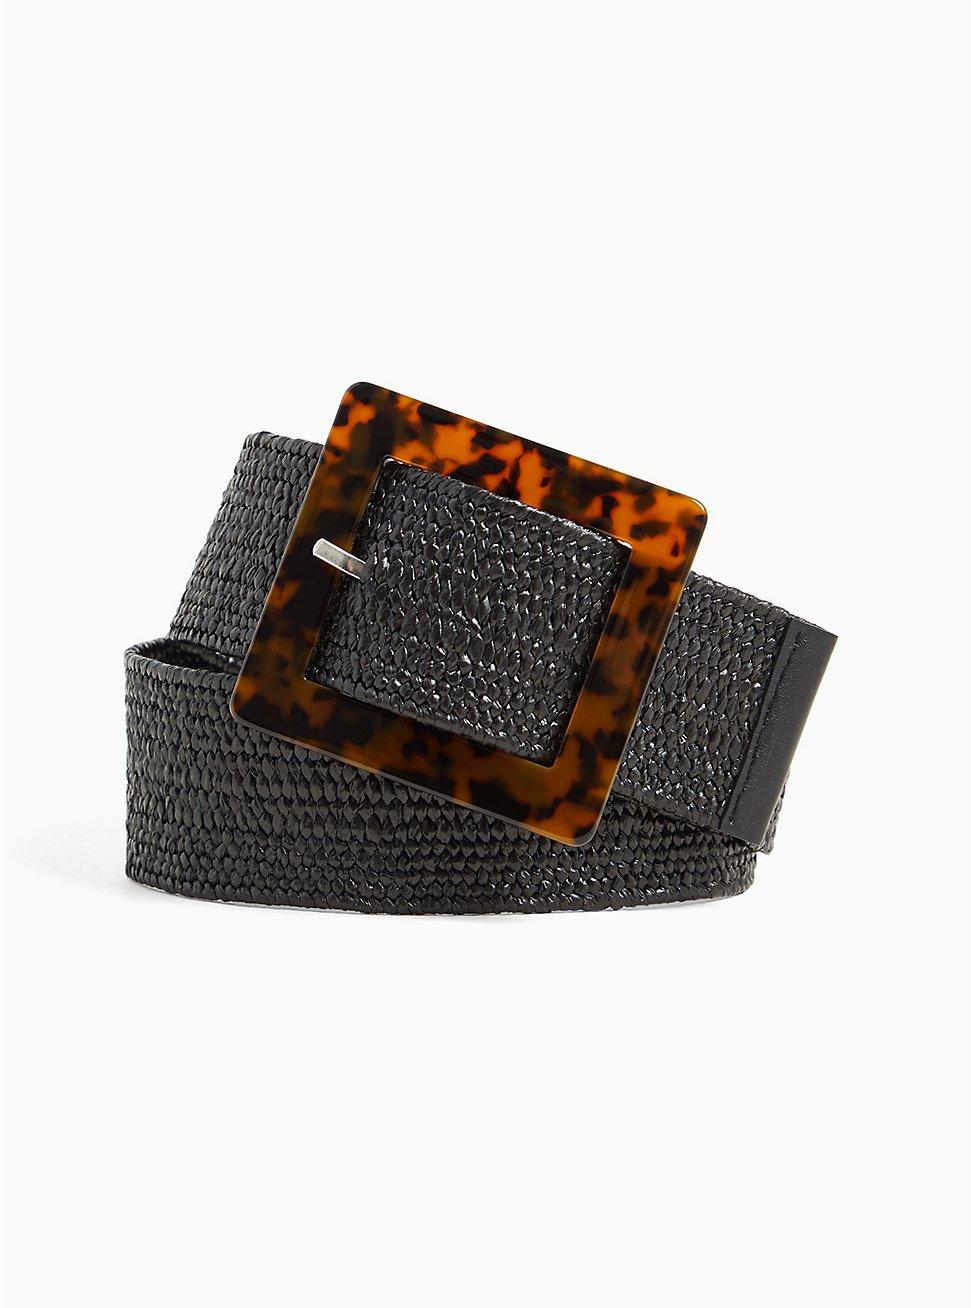 Black Straw Tortoiseshell Buckle Belt, BLACK, hi-res